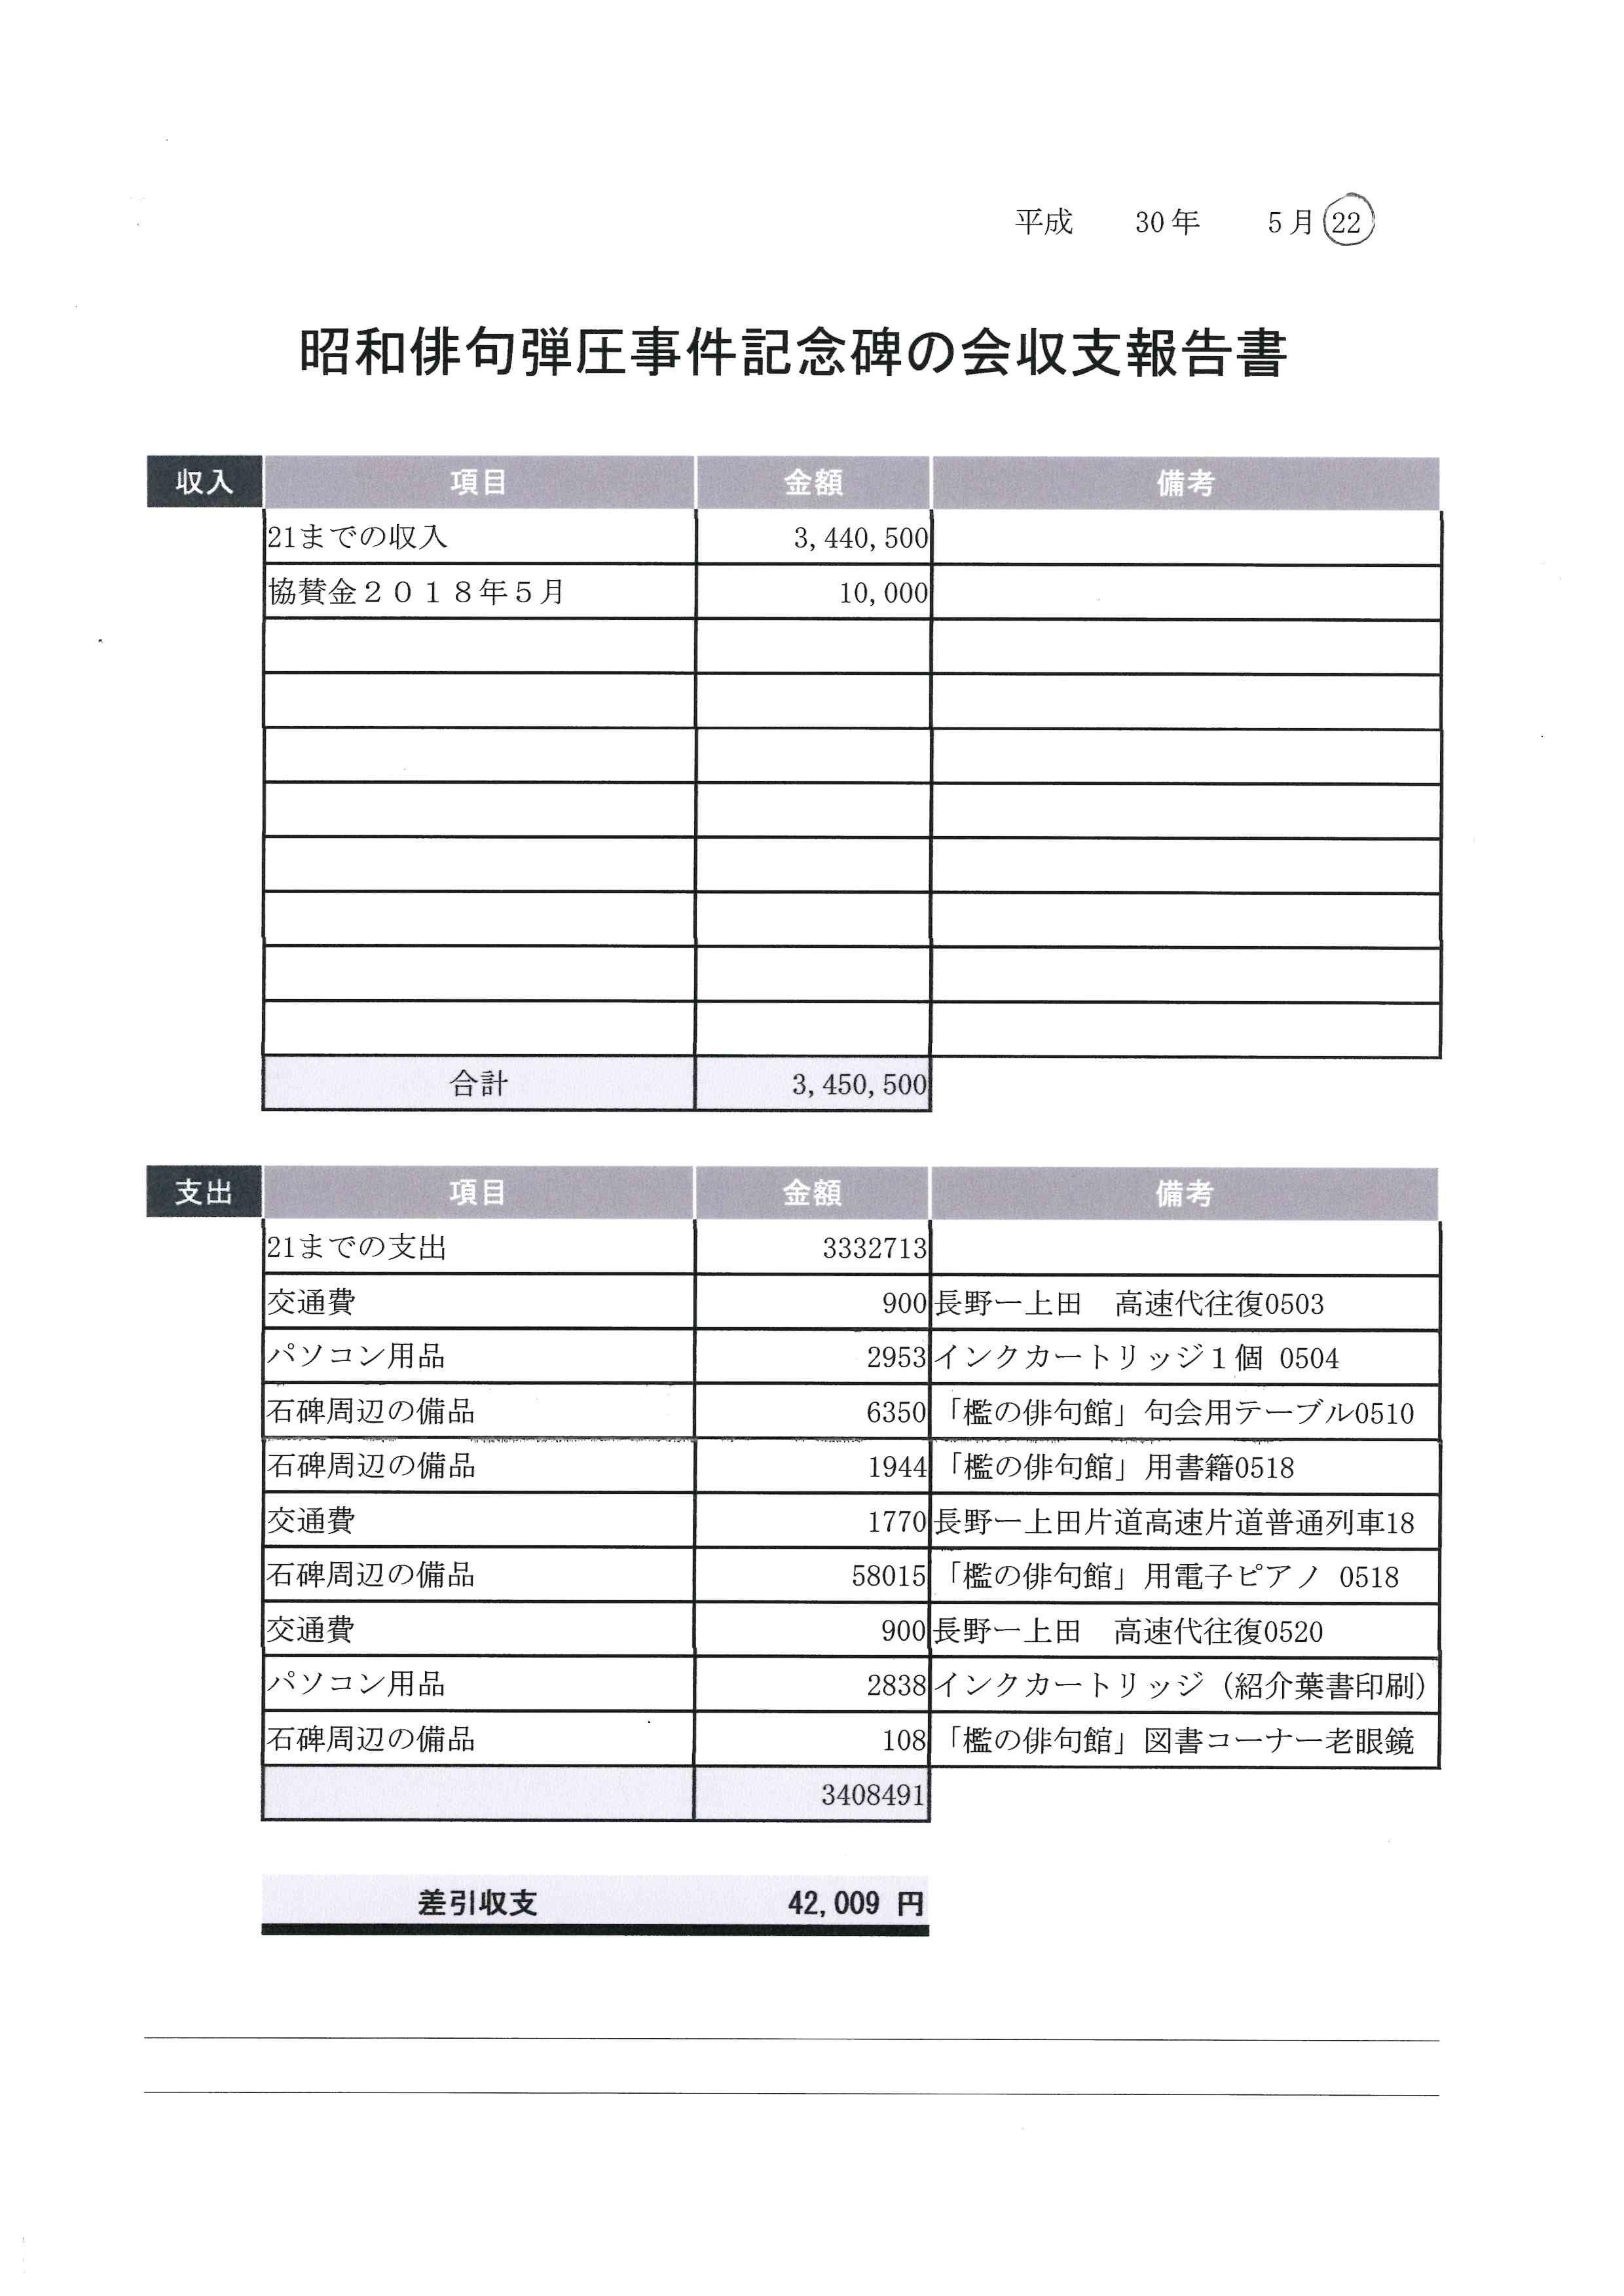 最終会計報告(2017年2月~2018年7月)と中間会計報告(2018年5、6、7月分) (Accounting report 2018/5,6,7 & final report)_e0375210_08221239.jpg